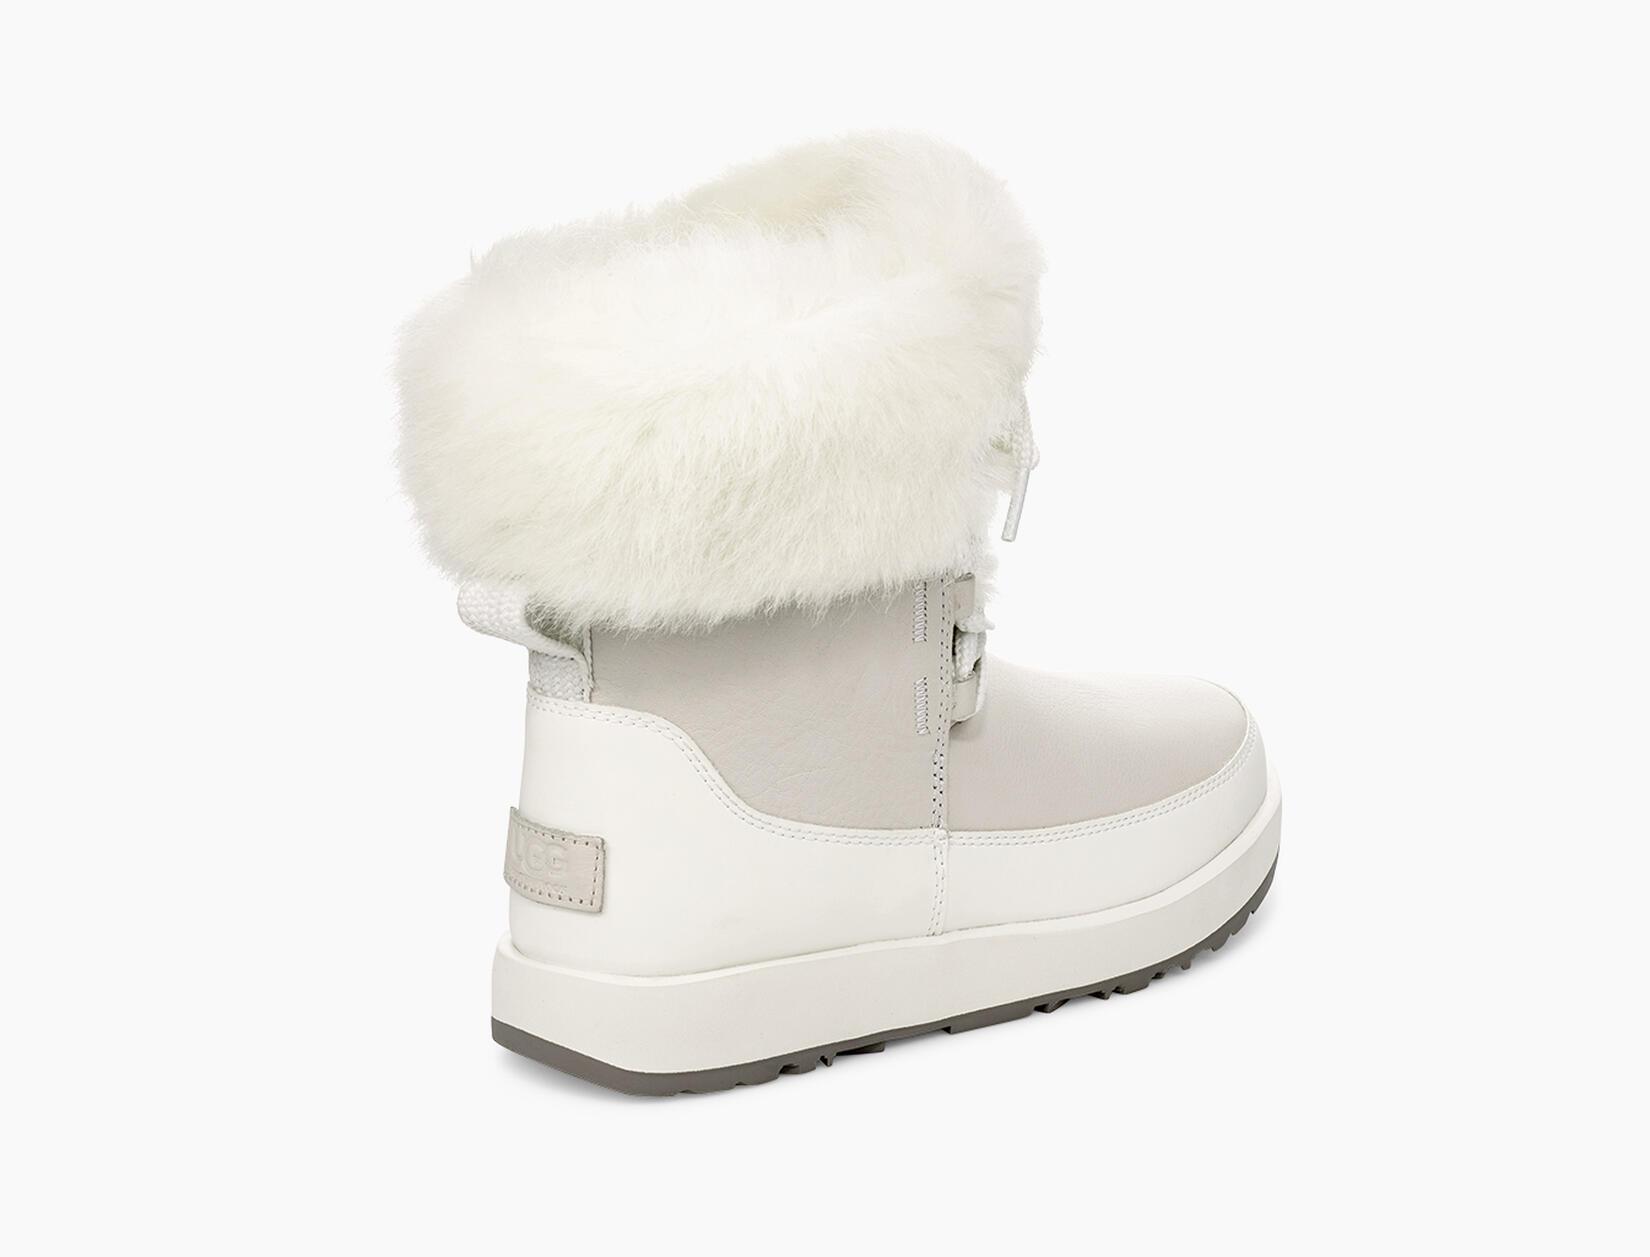 Gracie Waterproof Boot